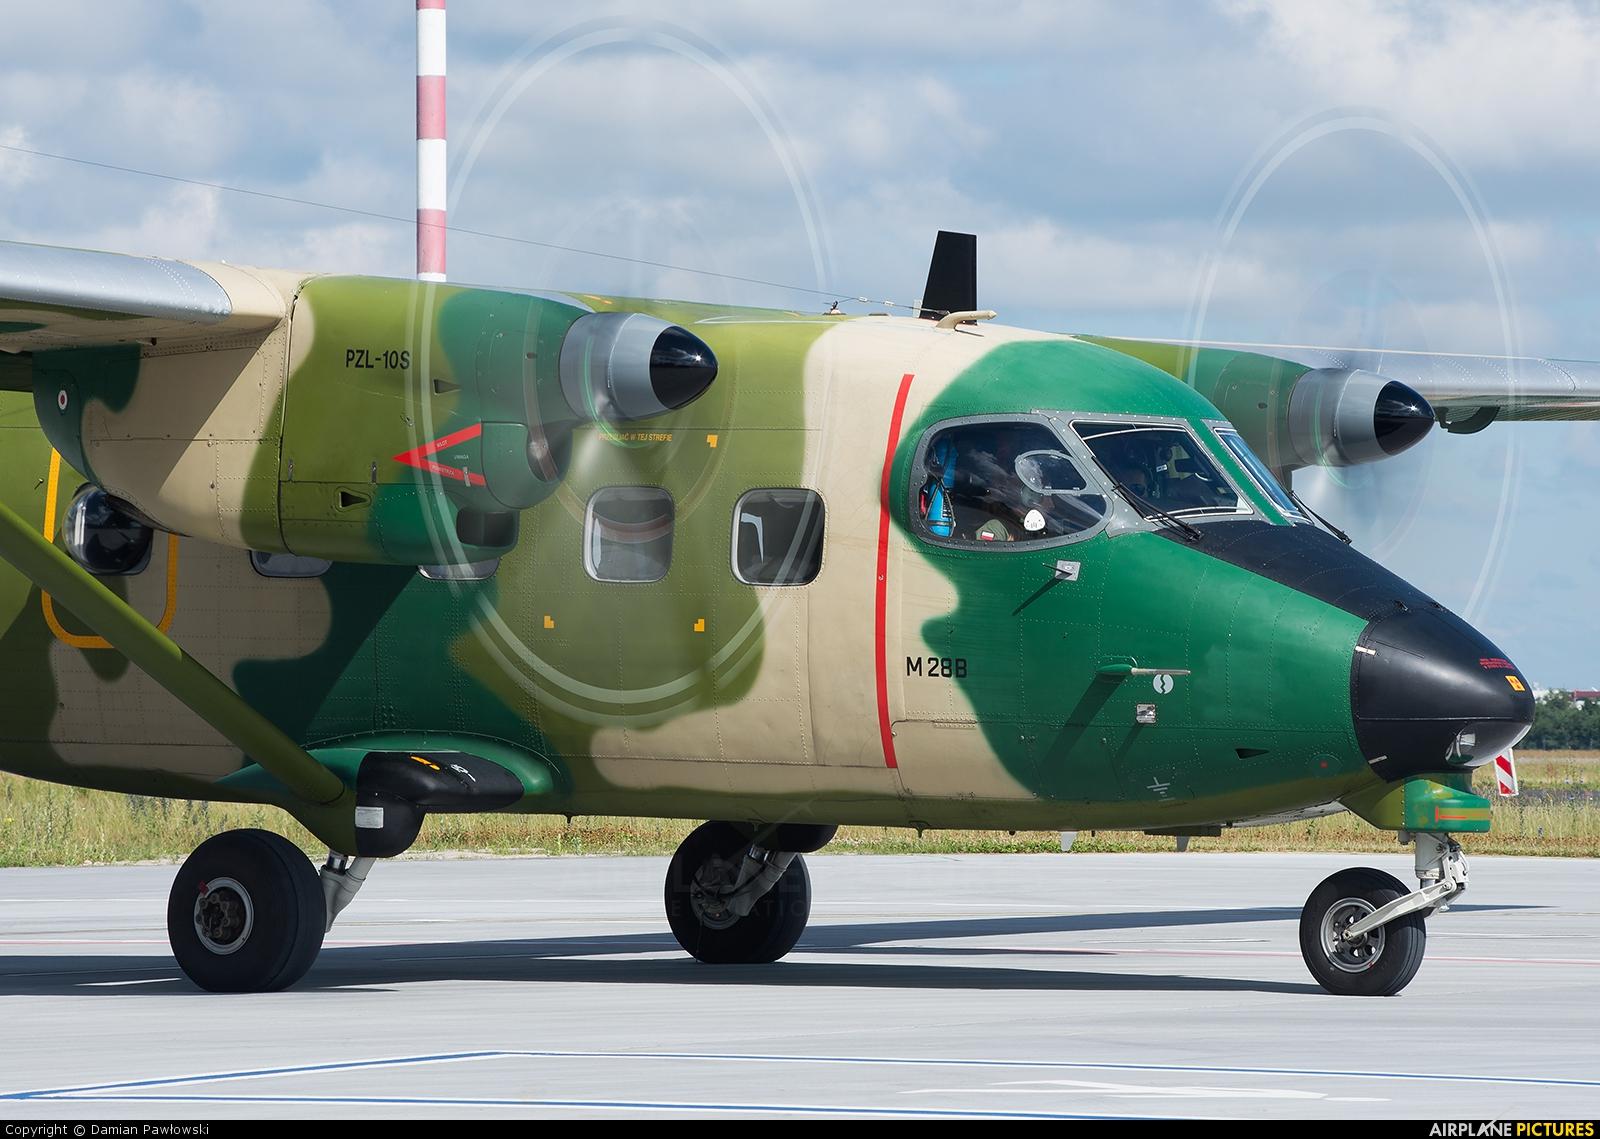 Poland - Air Force 0212 aircraft at Bydgoszcz - Szwederowo